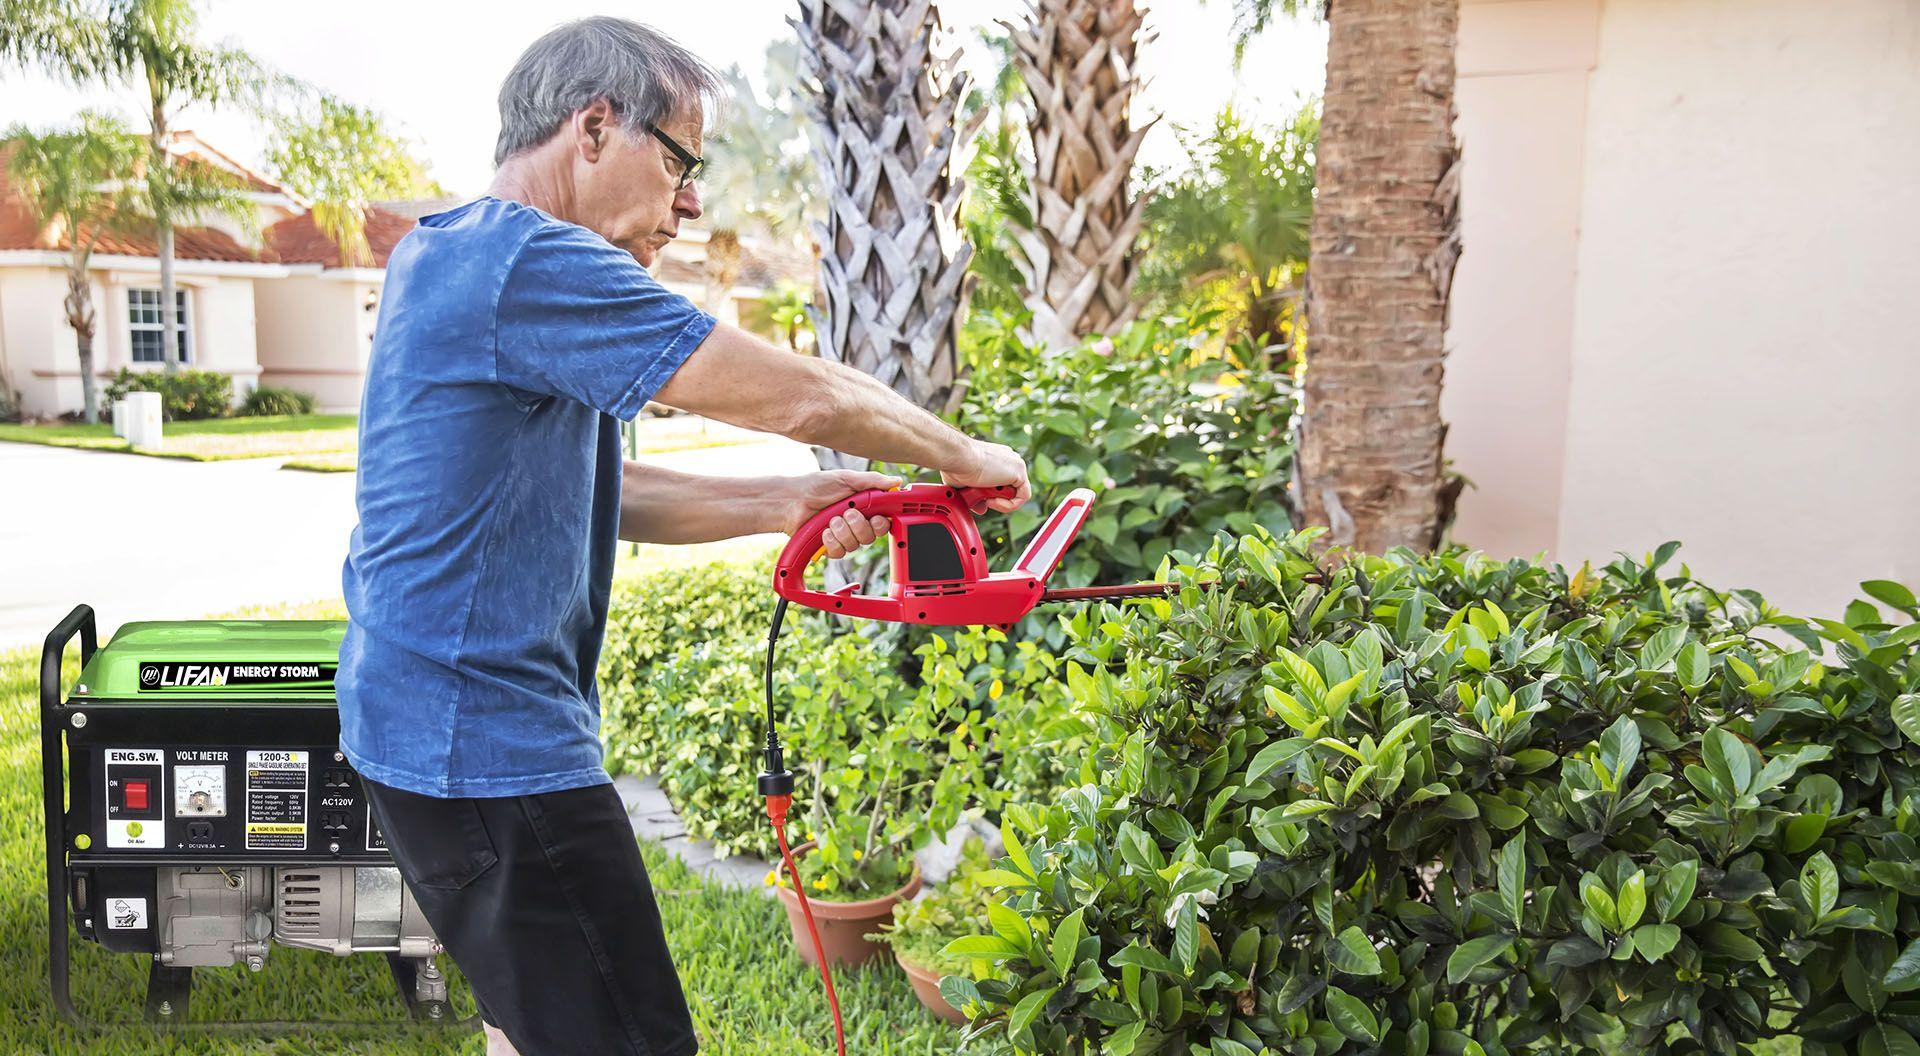 Senior caucasian man trims the hedges outside his home